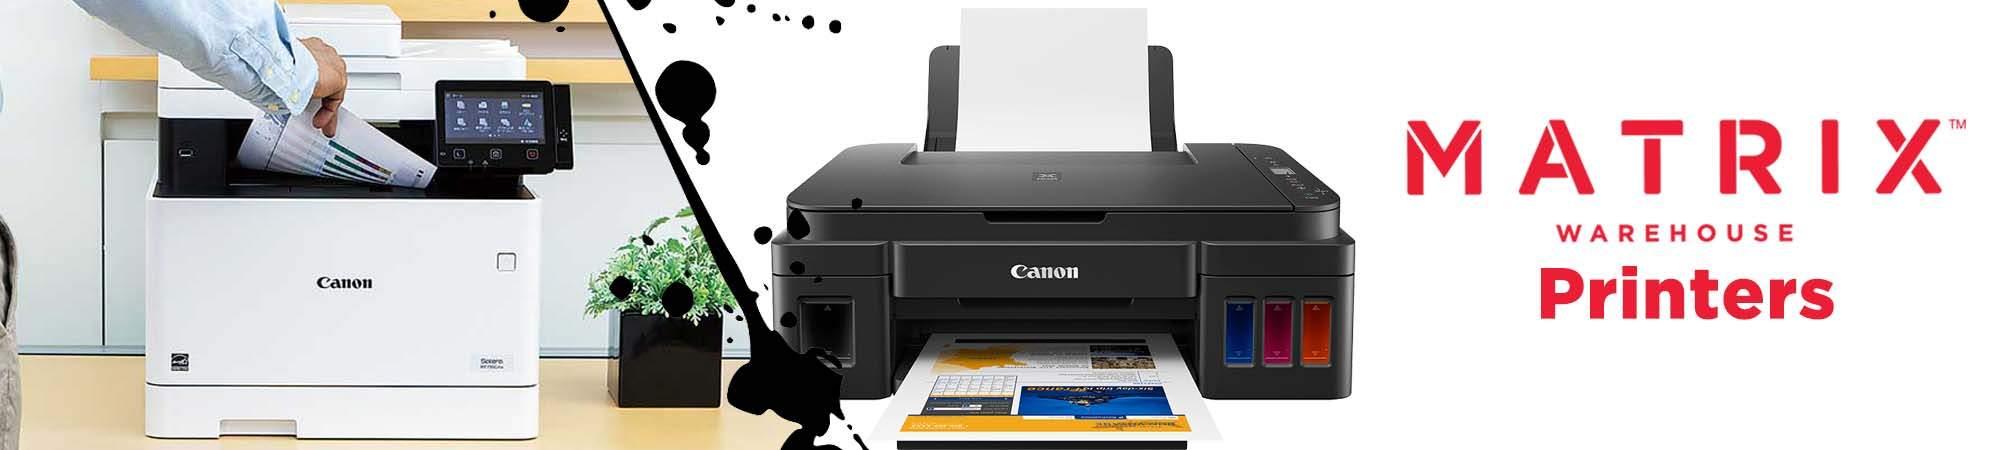 Printers Page September 2021